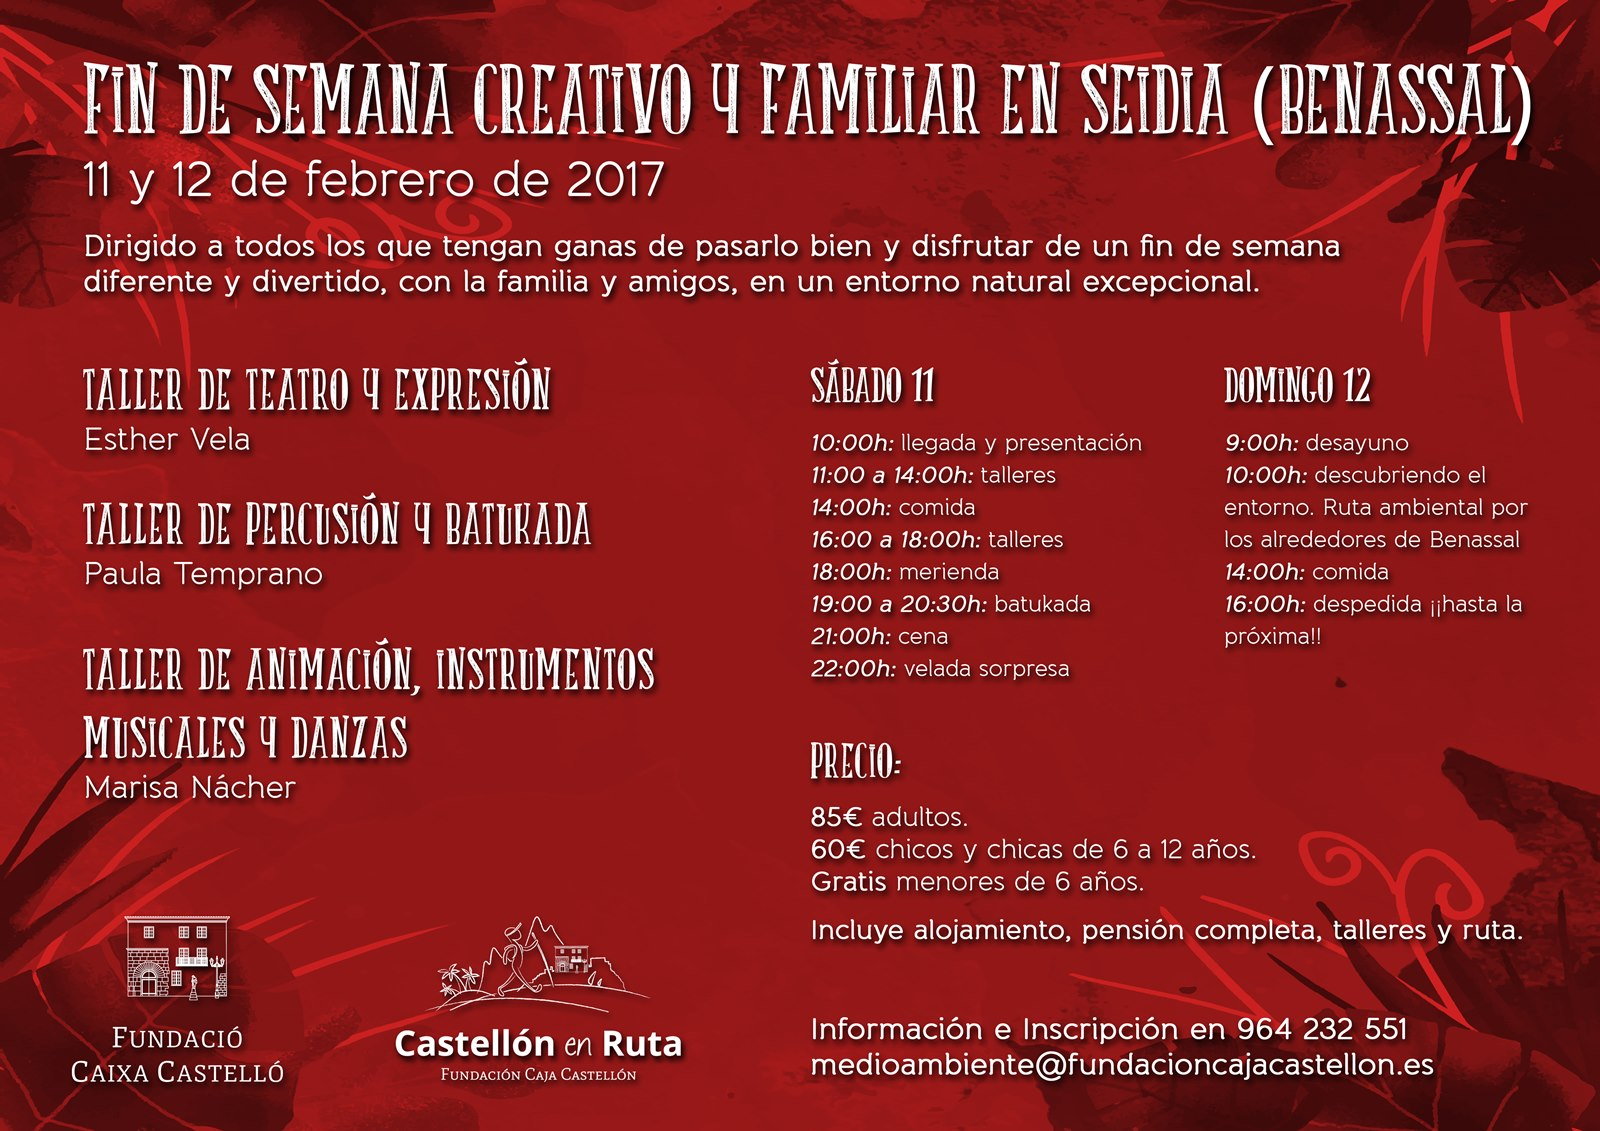 FIN DE SEMANA CREATIVO Y FAMILIAR Seidia castellano